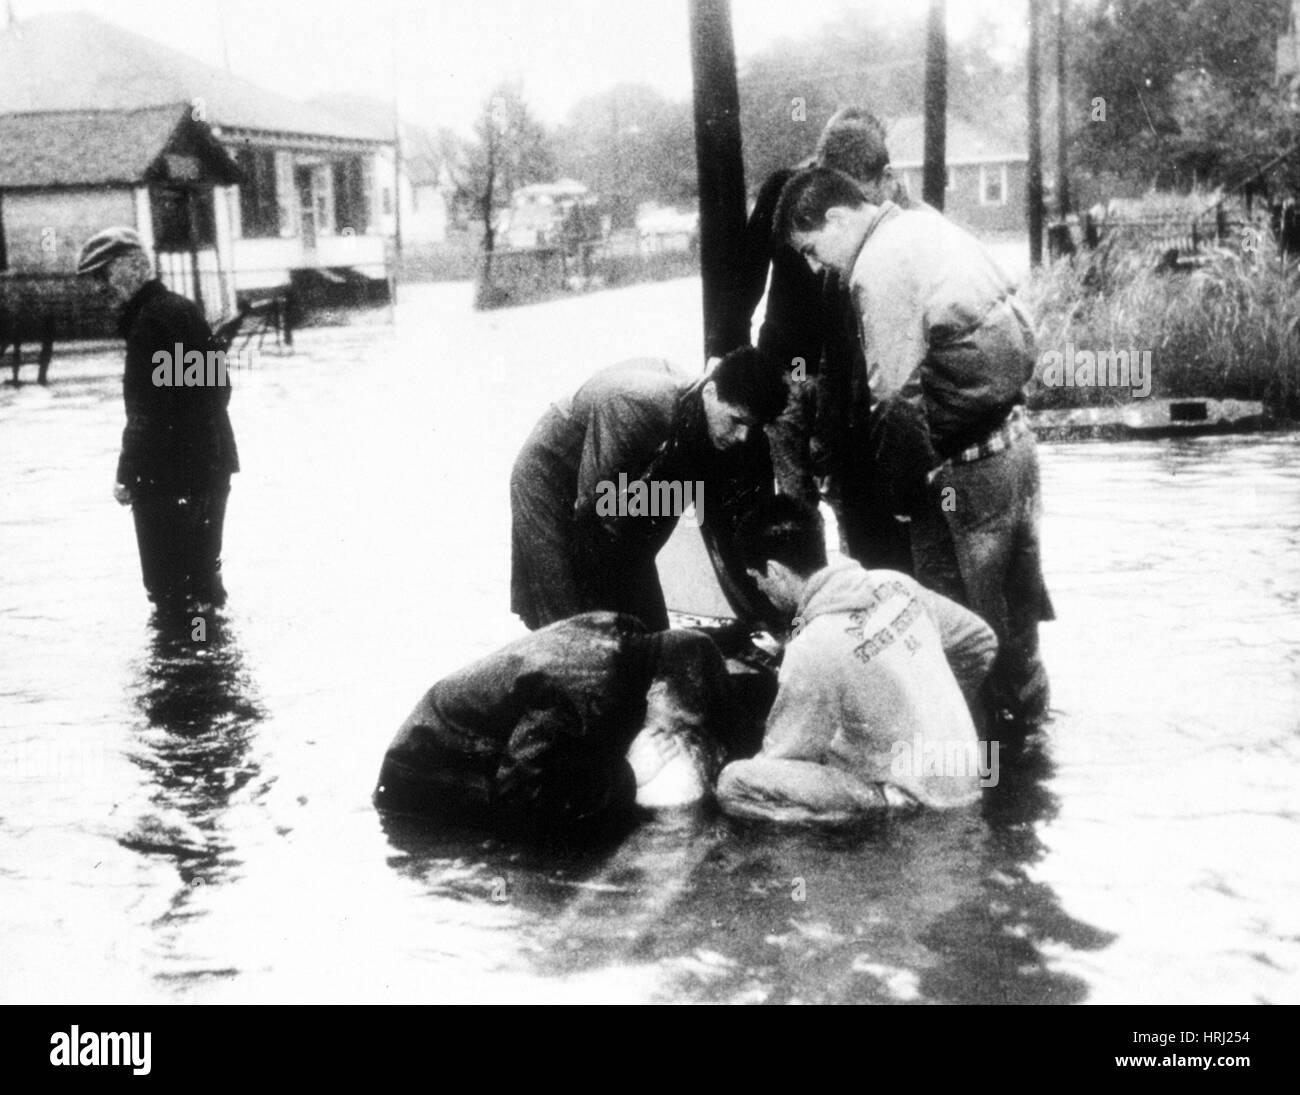 Flood Victim Rescued, 1960 - Stock Image